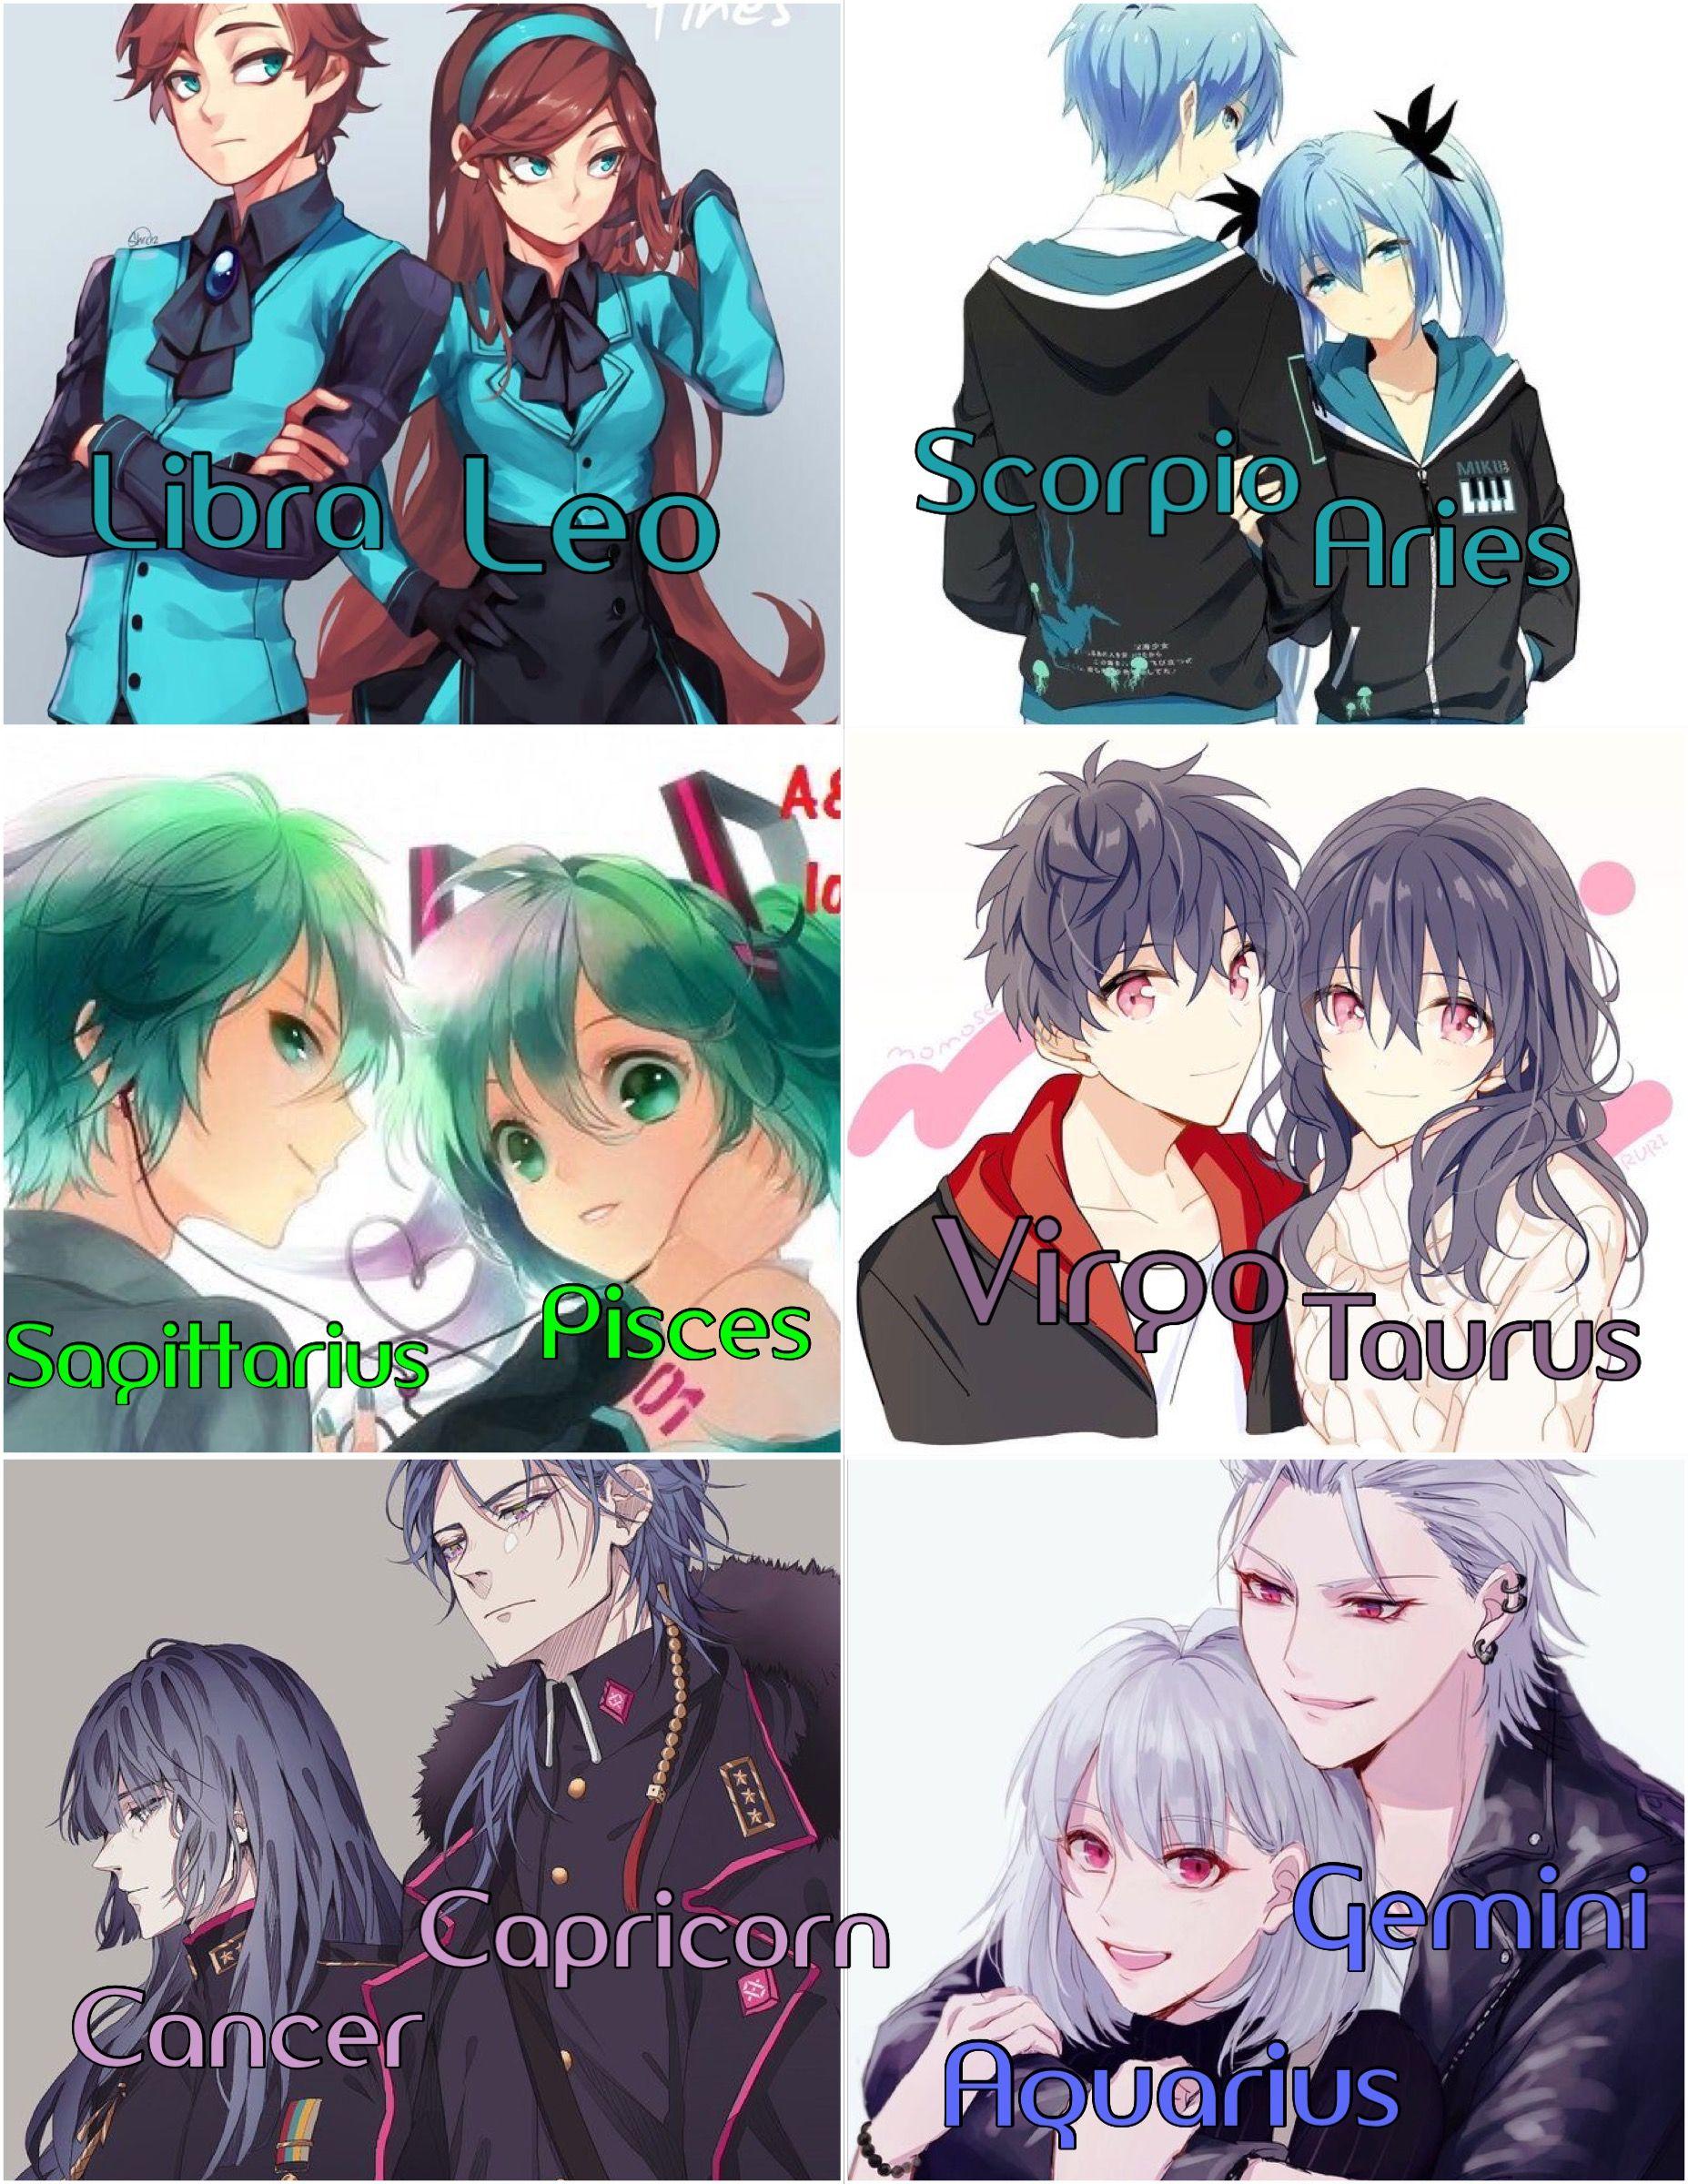 Finally A Female In Case U Don T Know Girl Taurus In 2021 Anime Zodiac Zodiac Signs Gemini Zodiac Characters